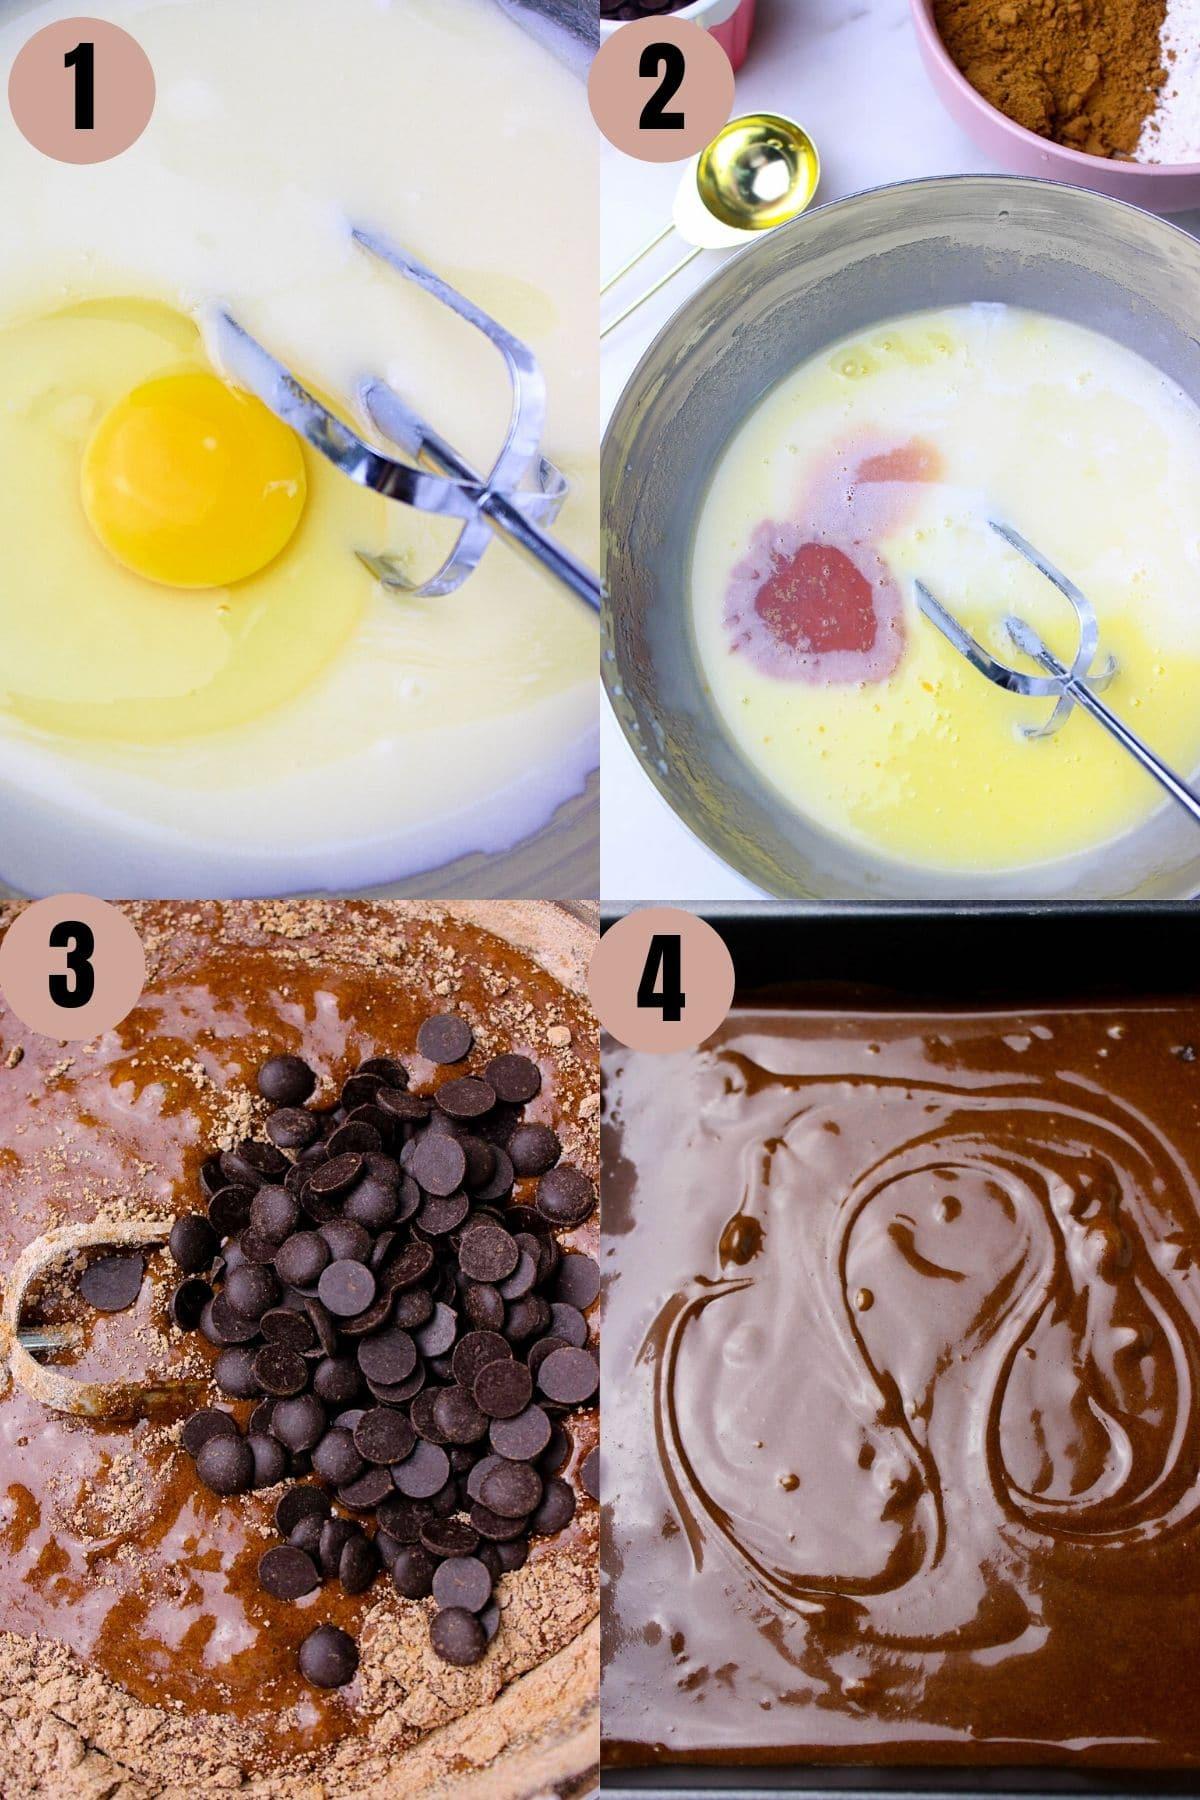 Process to make easy brownies in one bowl using simple ingredients.